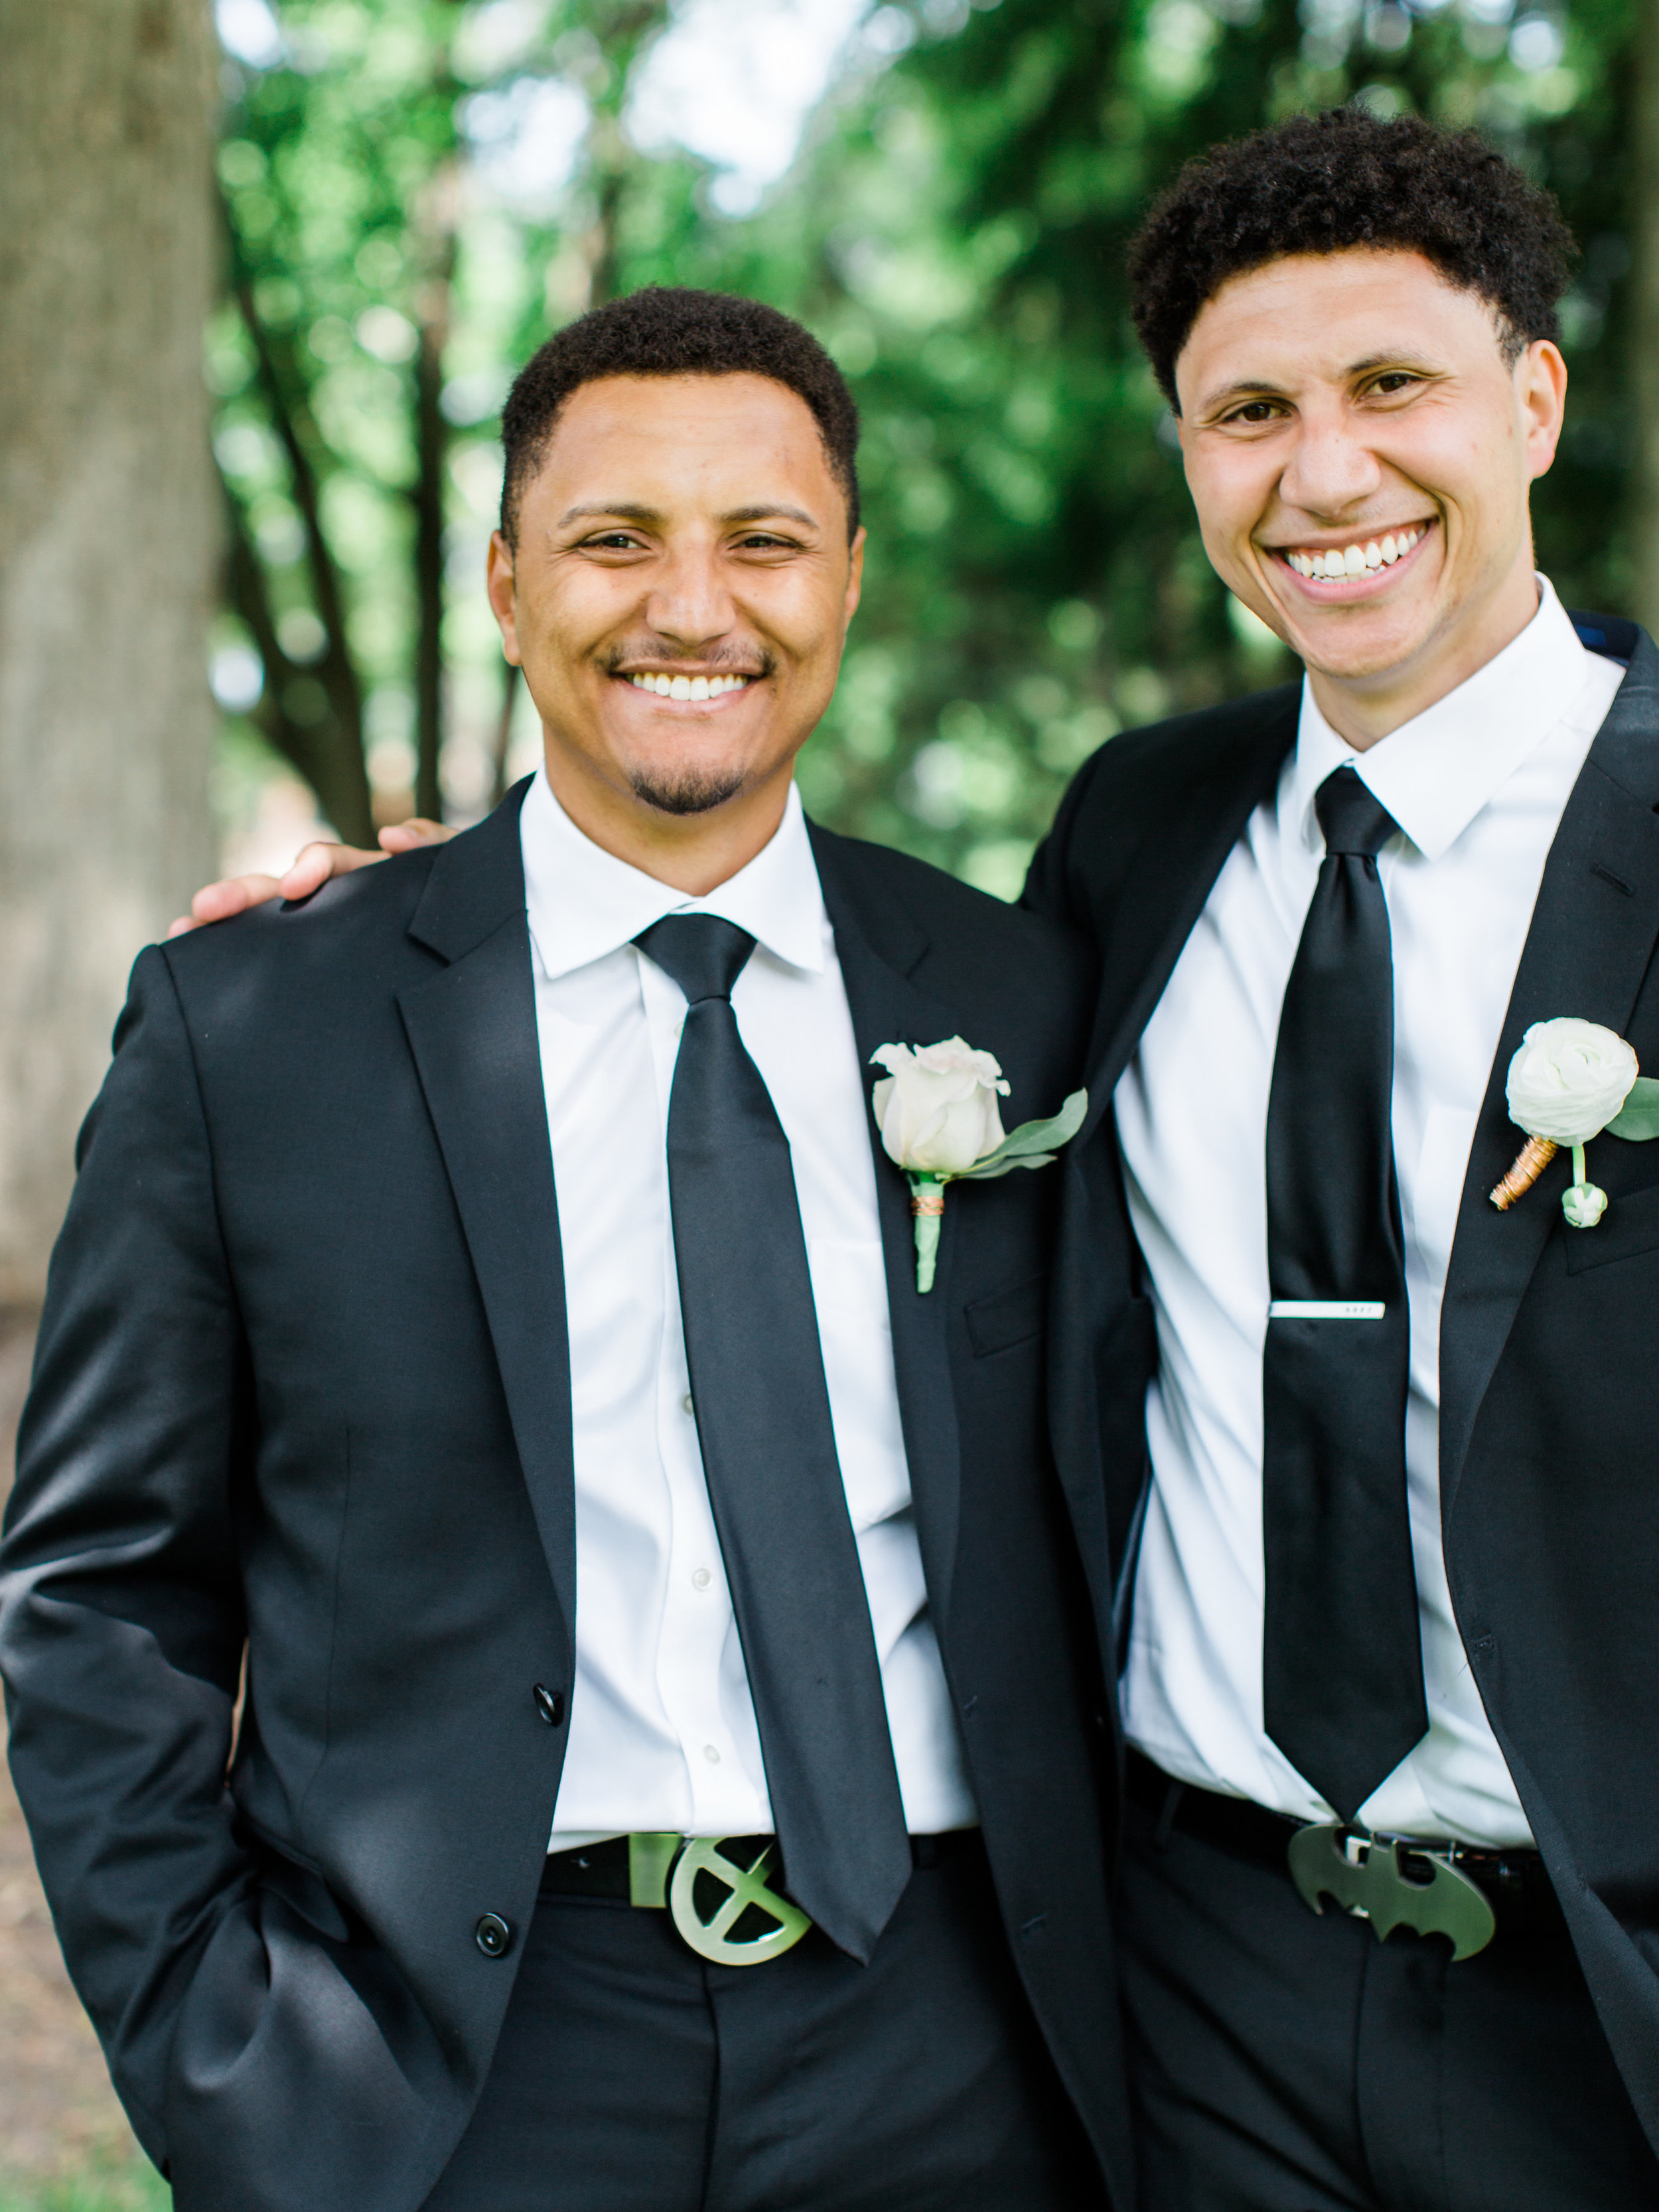 Julius+Wedding+BridalParty+Groomsmen-27.jpg